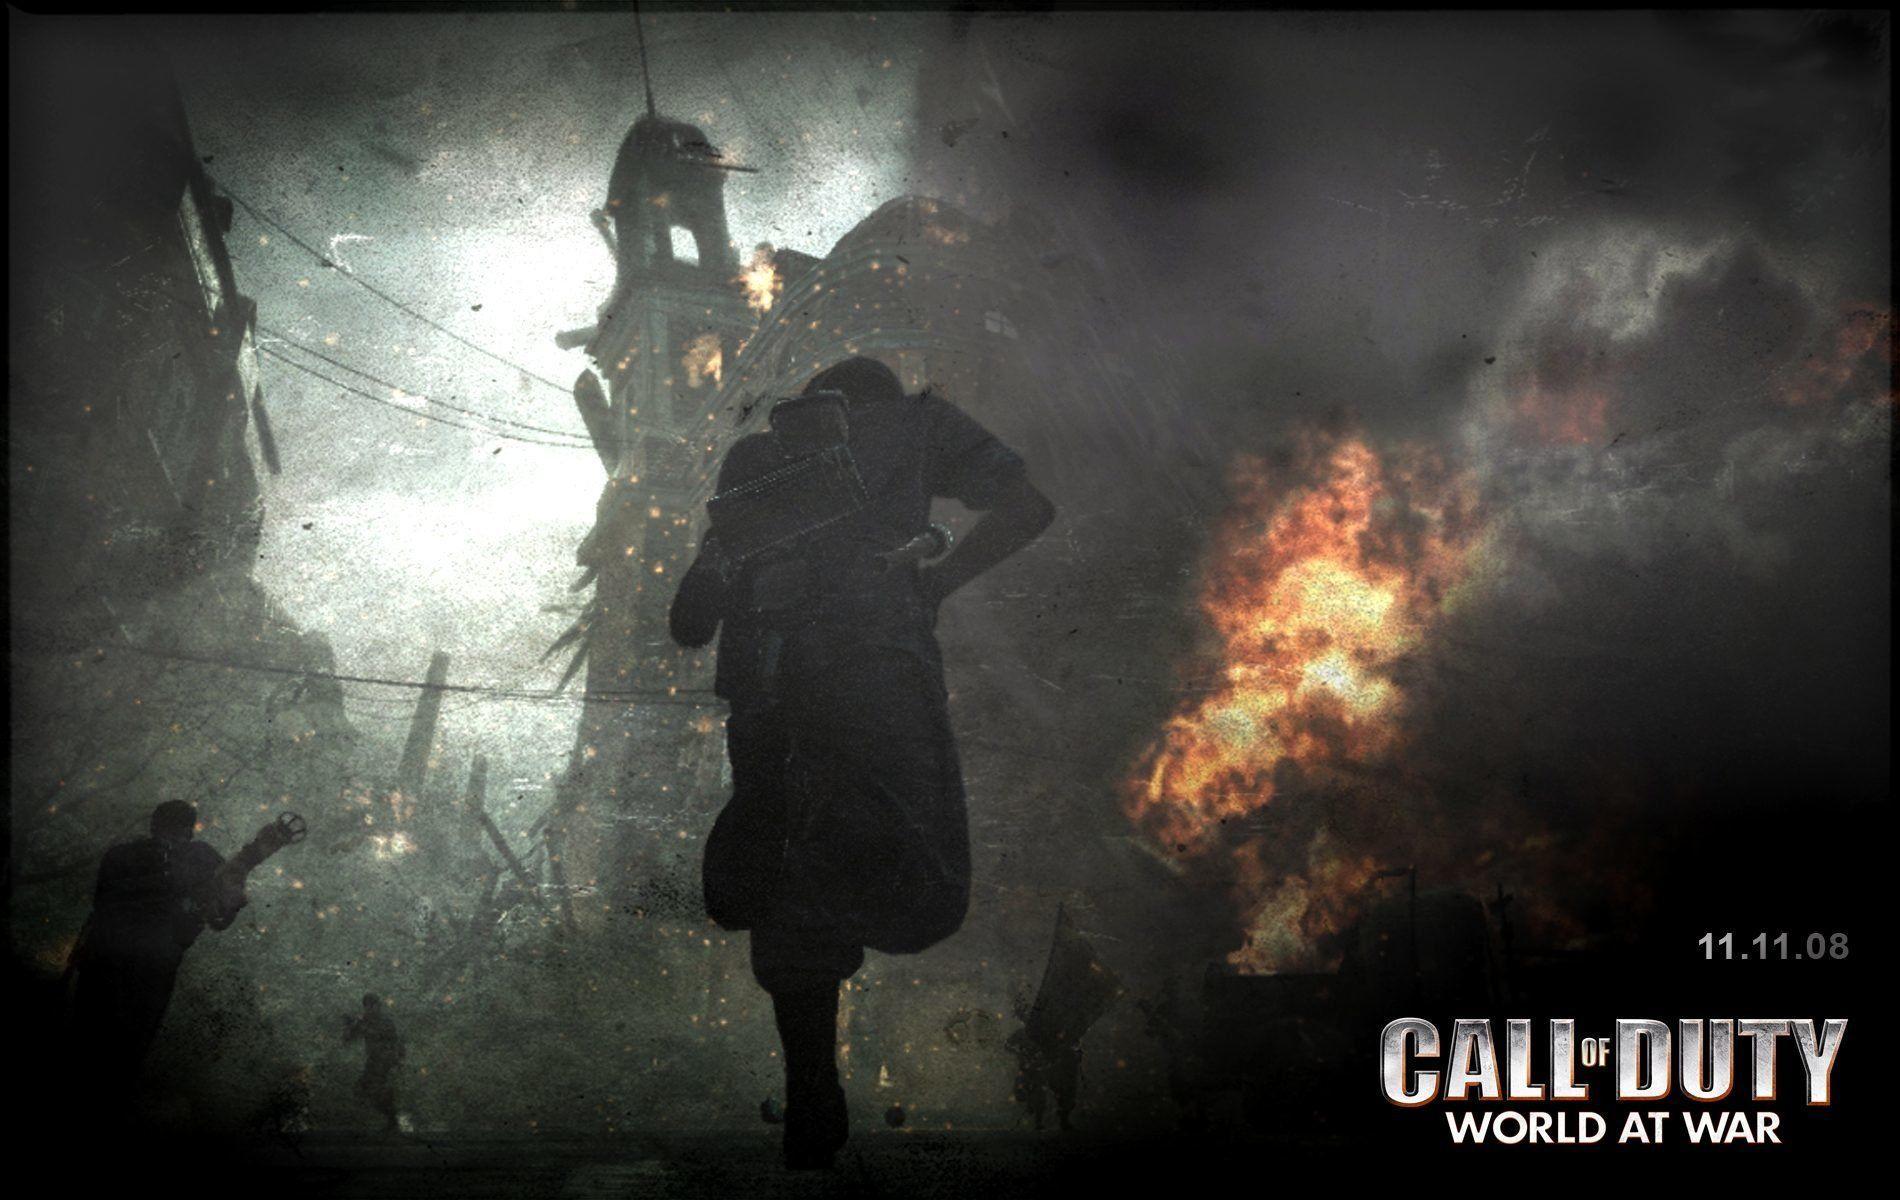 Call Of Duty World At War Wallpaper: COD WW2 Wallpapers